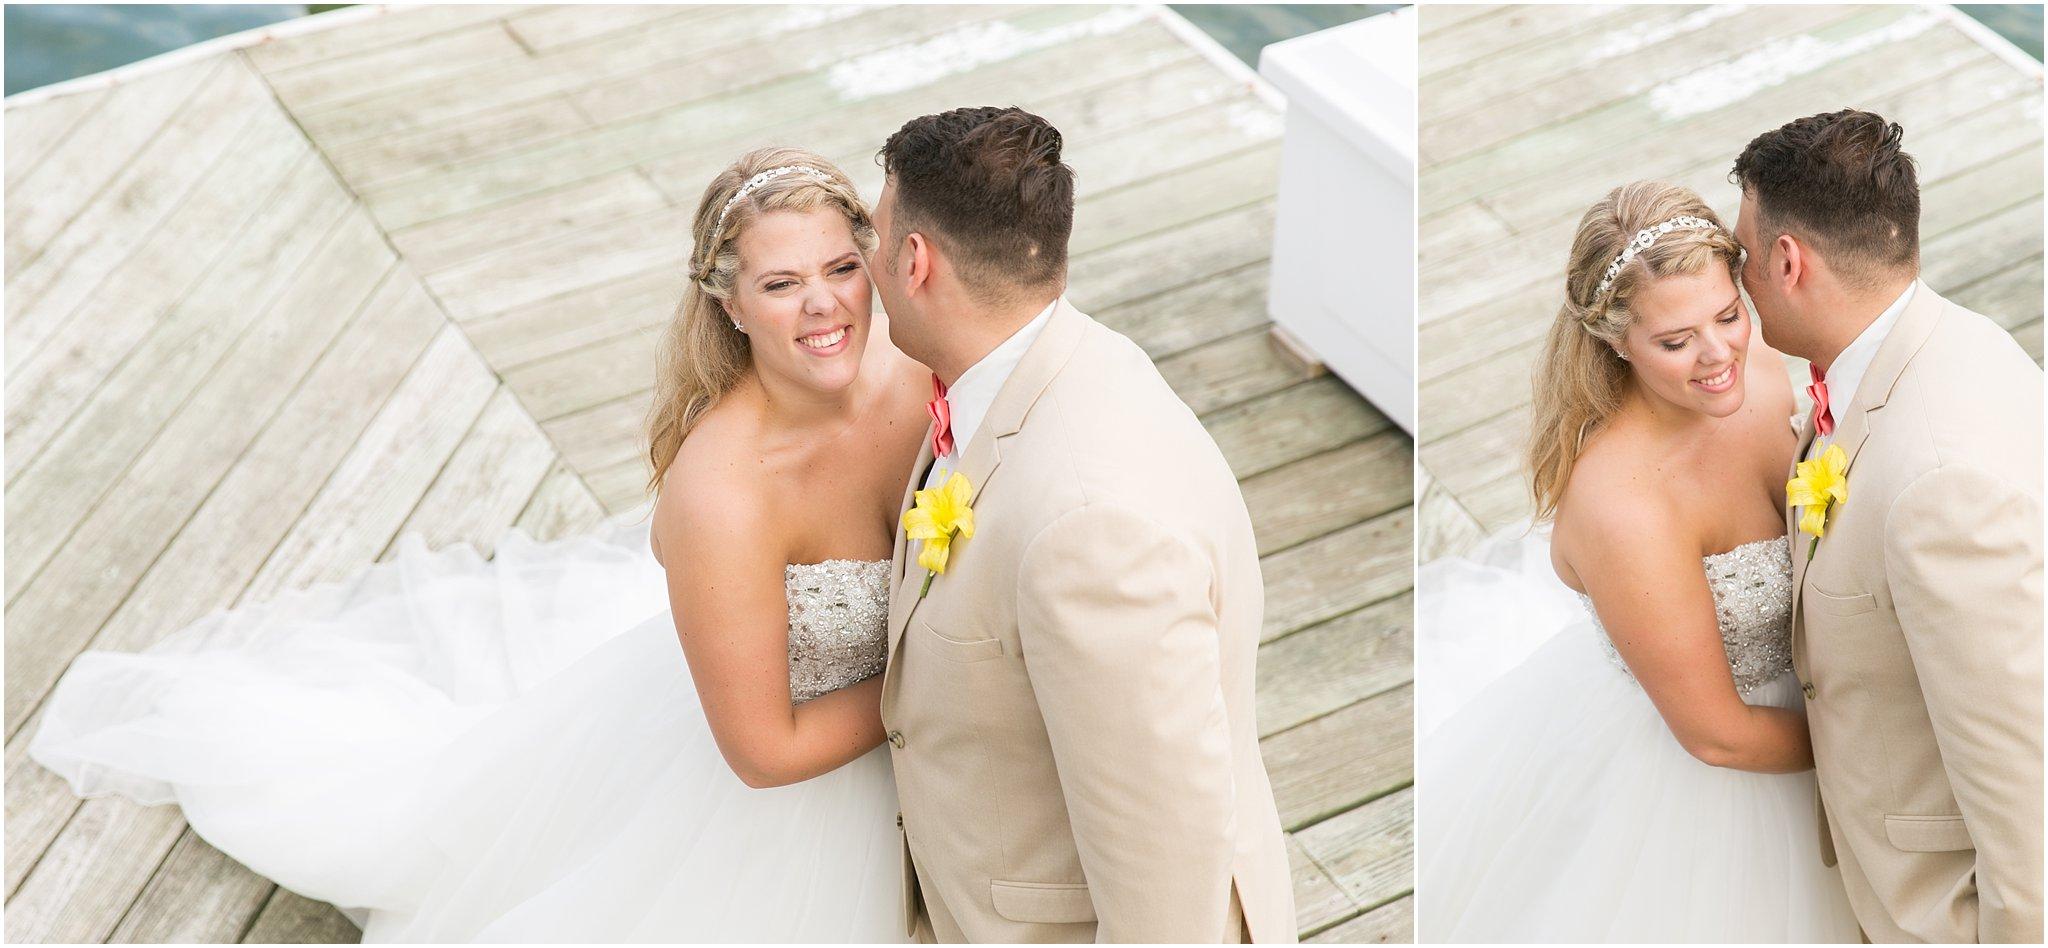 jessica_ryan_photography_wedding_hampton_roads_virginia_virginia_beach_weddings_0621